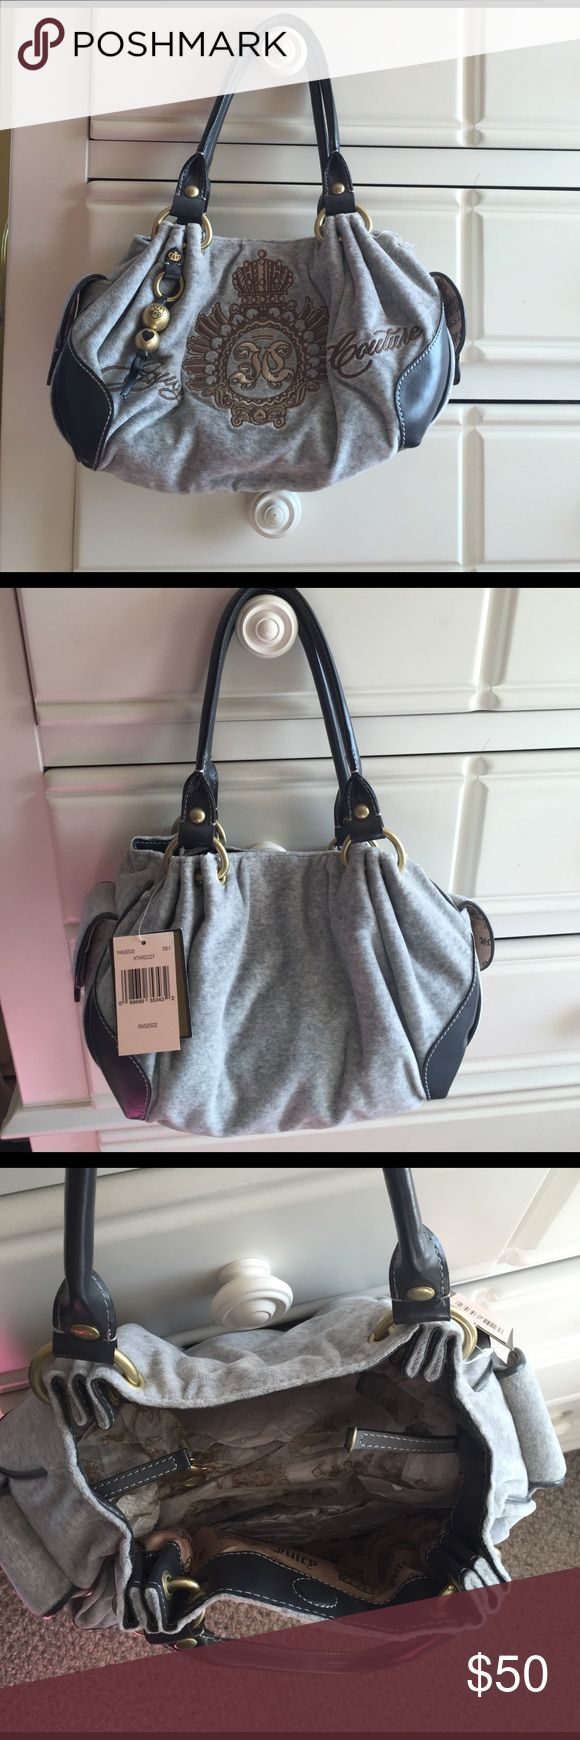 Juicy couture handbag Never used!! Light gray juicy couture purse Juicy Couture Bags Shoulder Bags